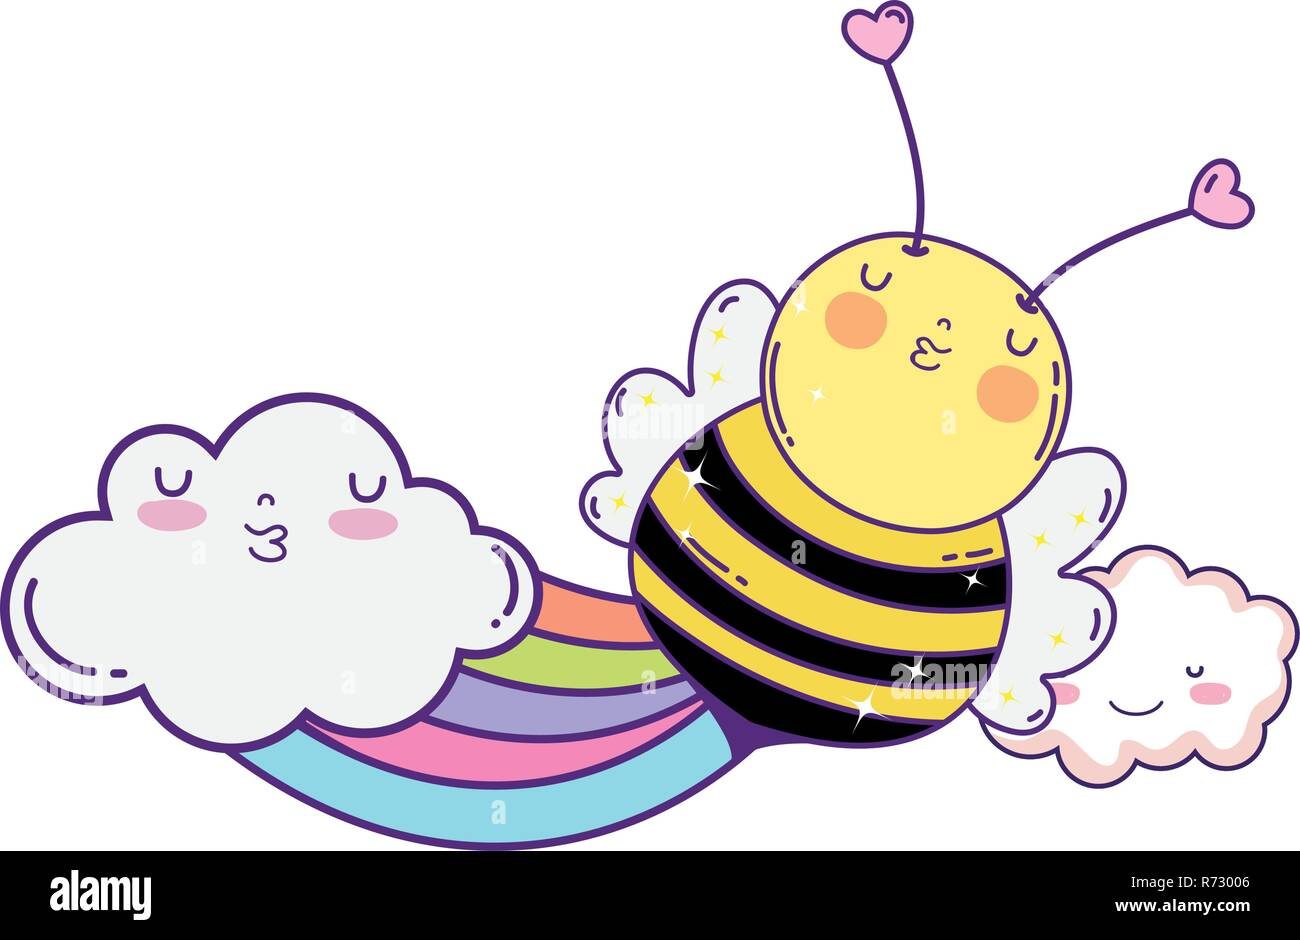 little bee with rainbow kawaii character - Stock Image